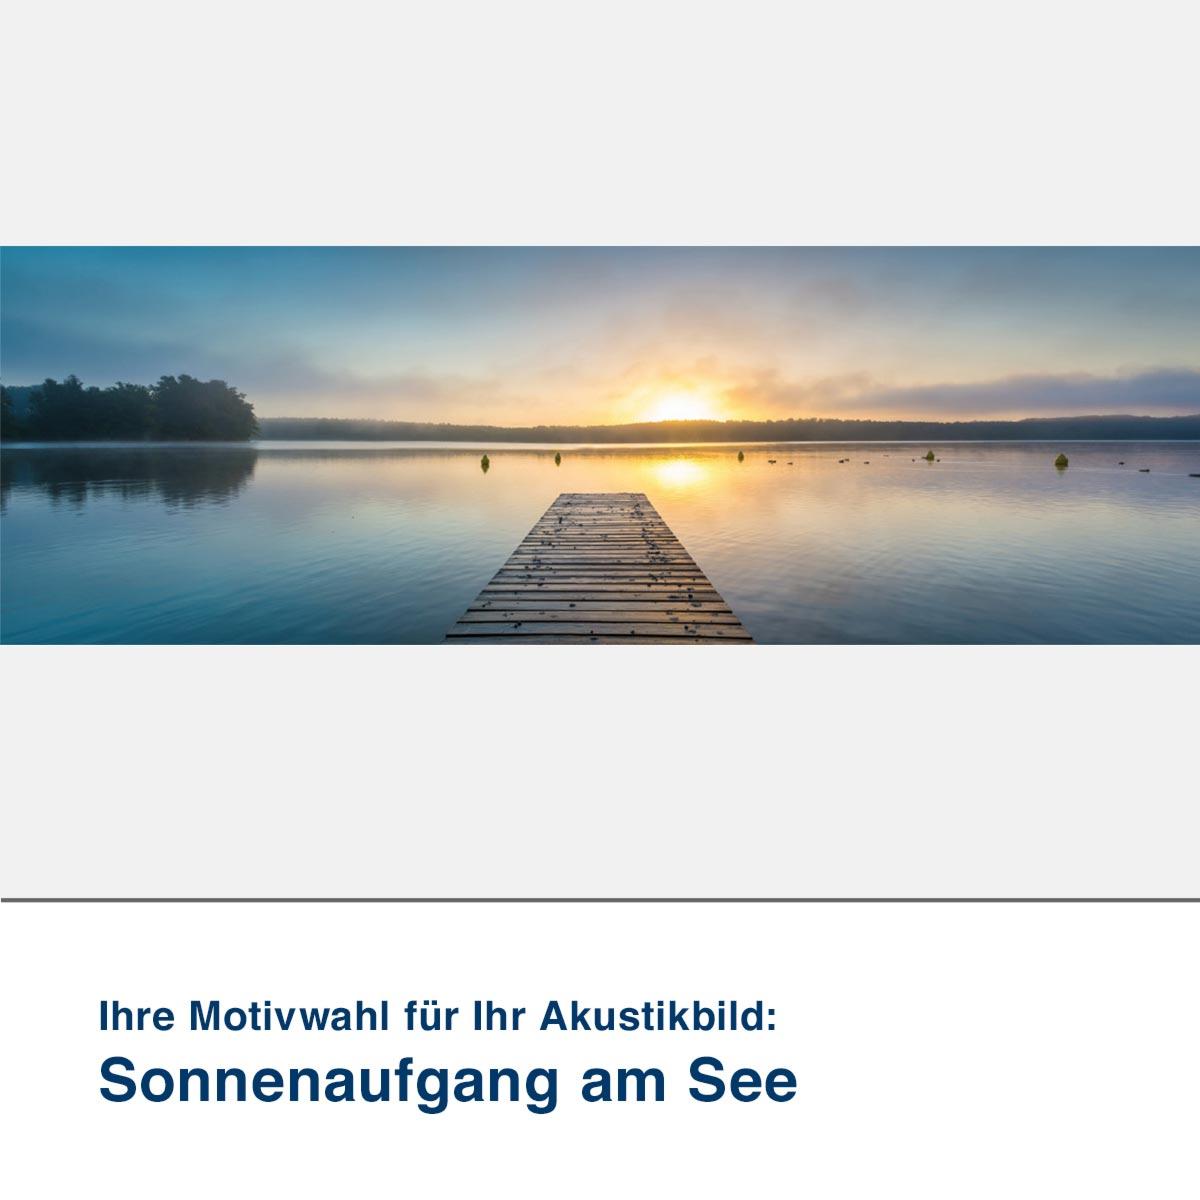 Akustikbild Motiv Sonnenaufgang am See